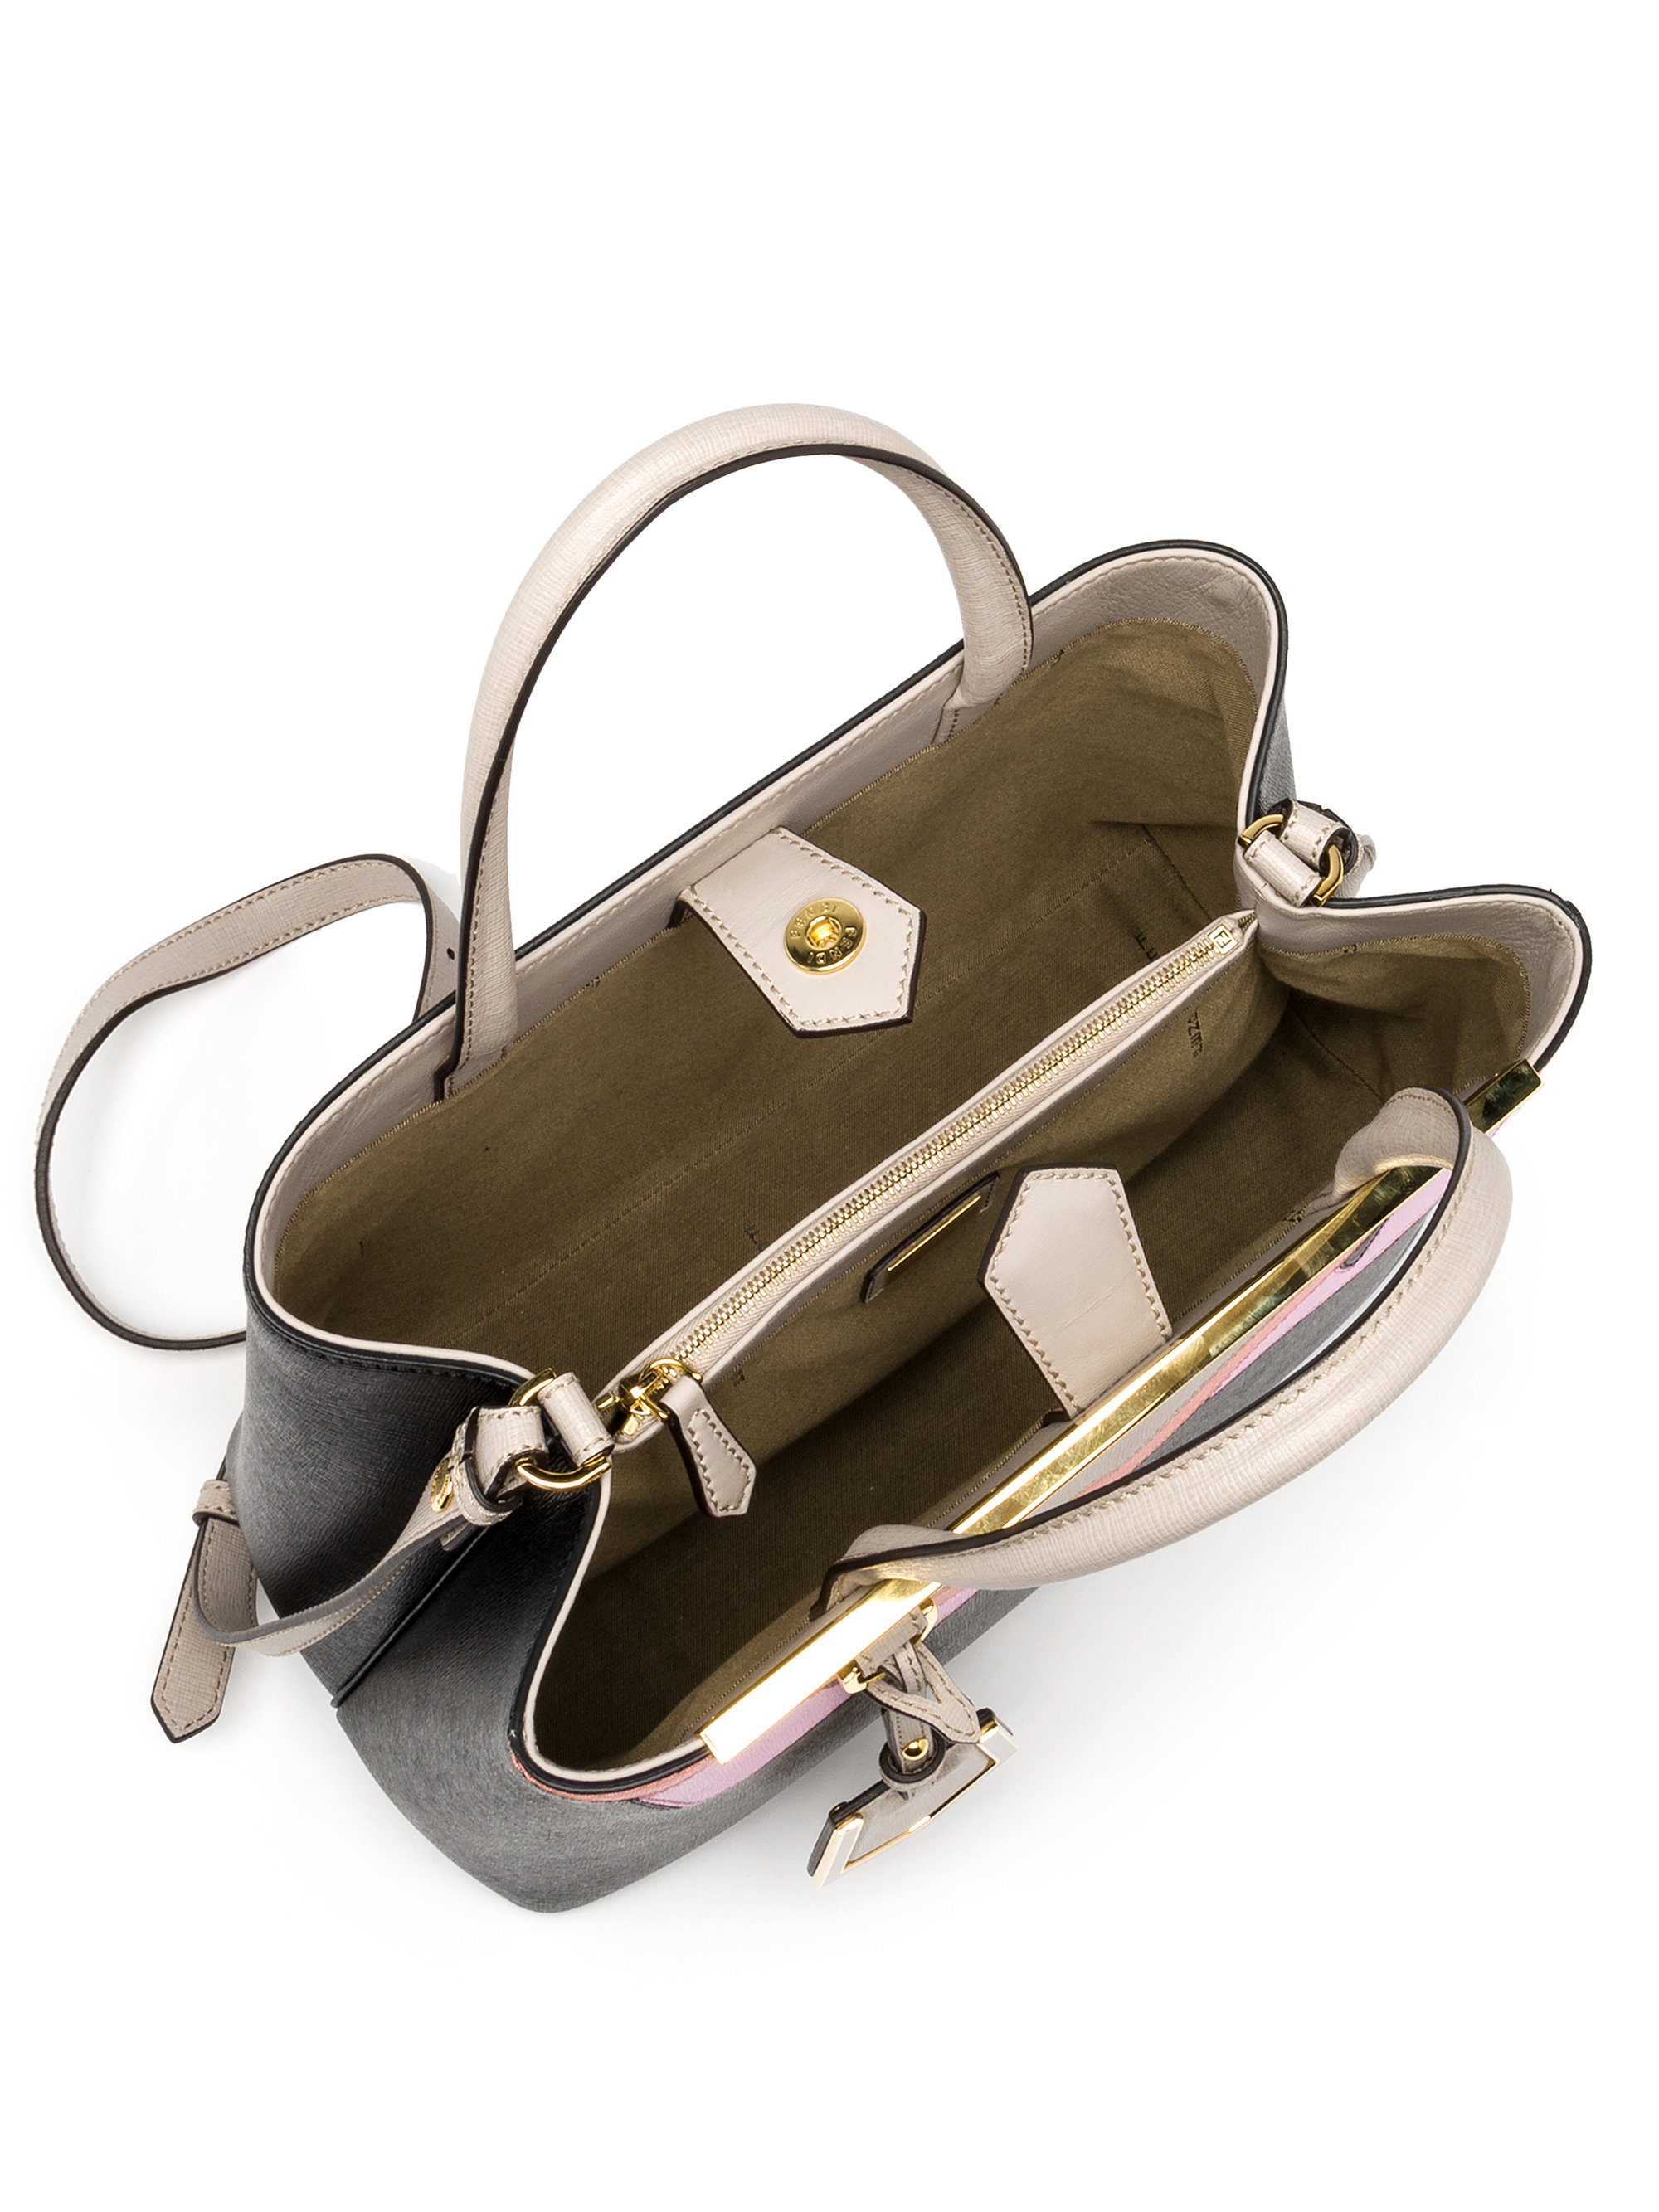 replica chloe handbags - fendi 2jours small monster face satchel, cheap fendi handbags